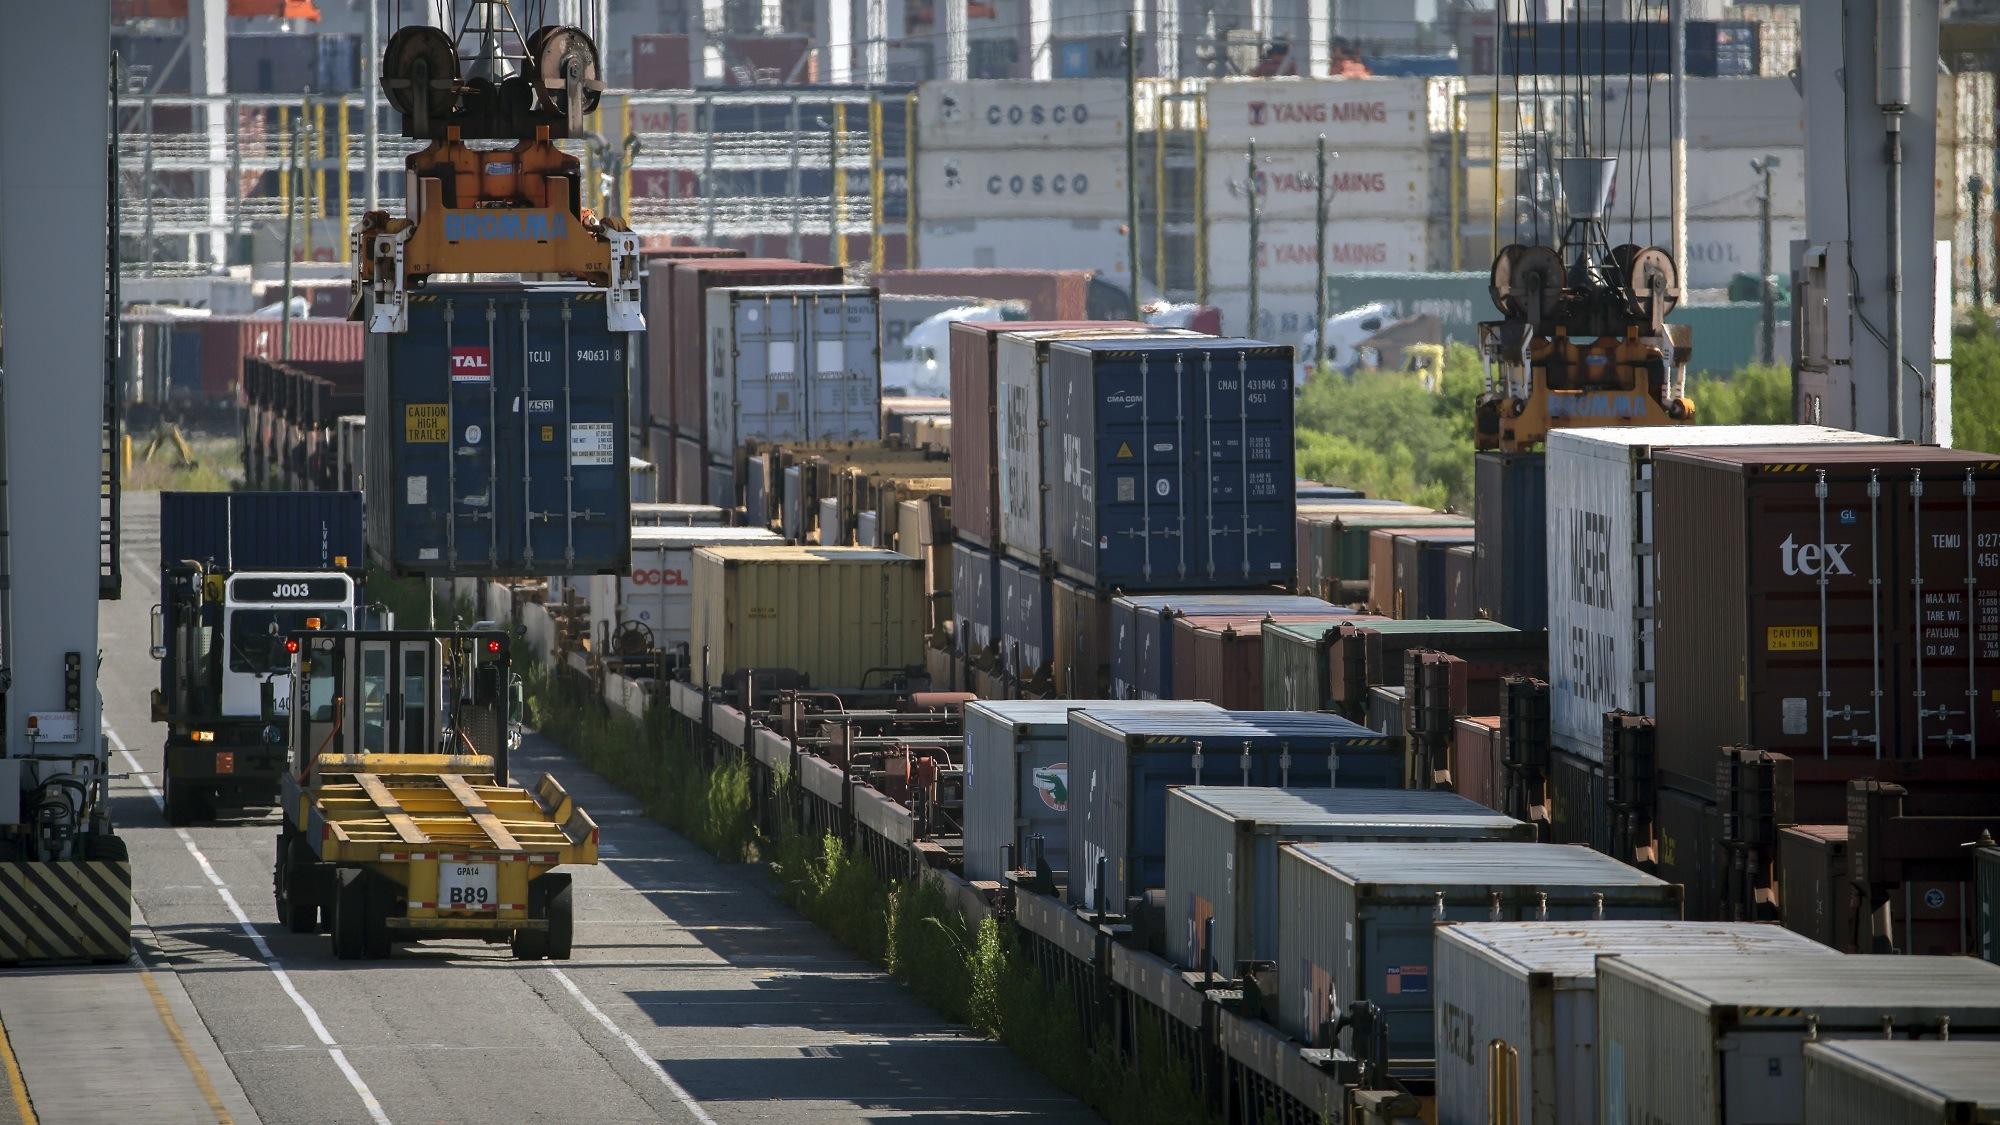 Garden City Terminal cargo import and export Georgia Ports Authority, Monday, July 11, 2016, at the Garden City Terminal near Savannah, Ga.  (GPA Photo/Stephen B. Morton)